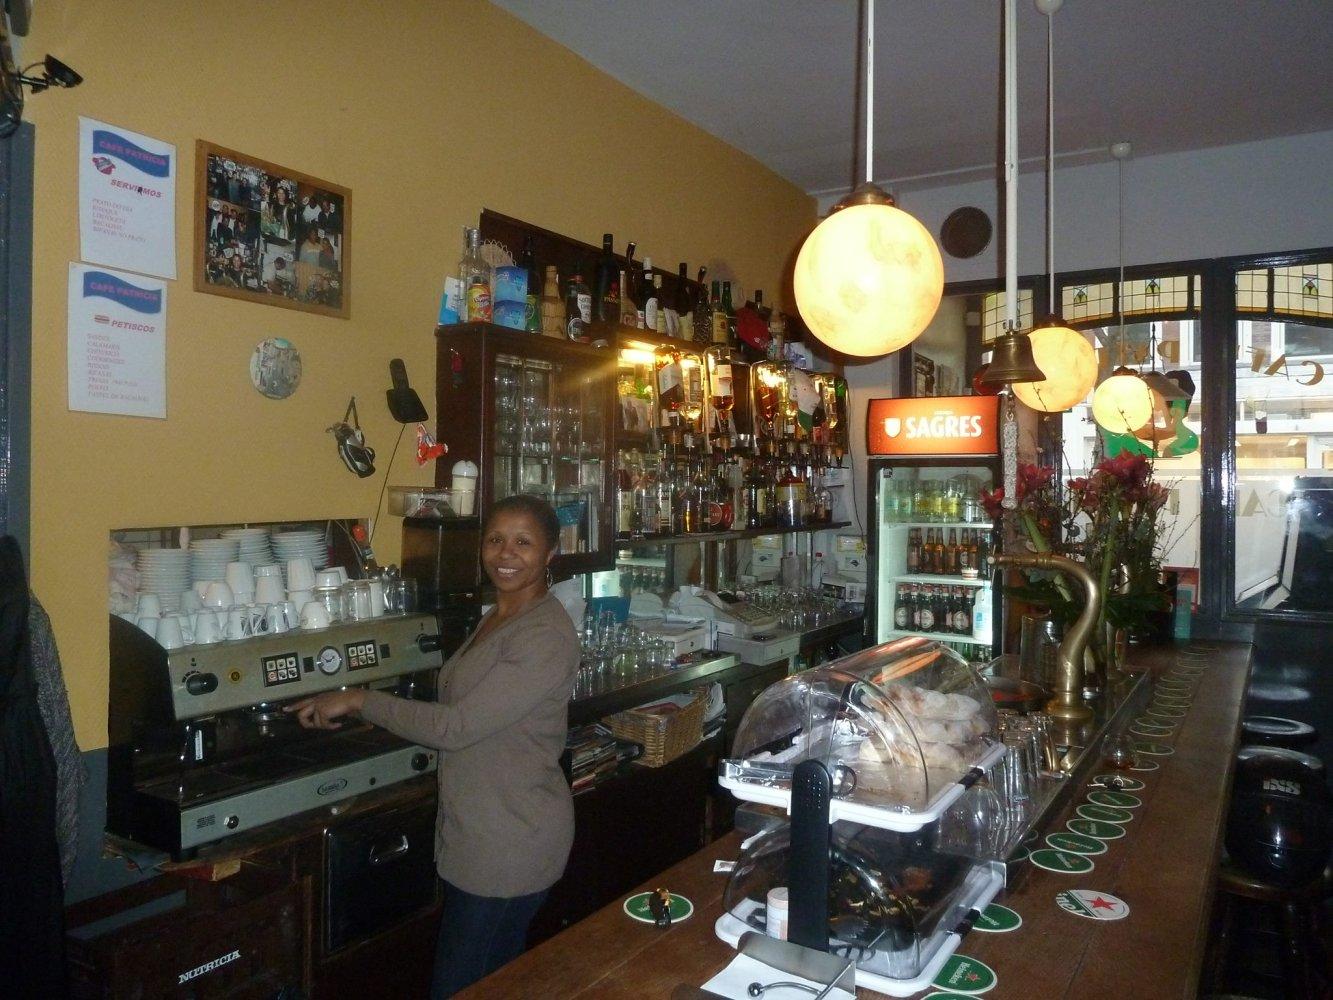 Cafe patricia rotterdam for Bioscoopagenda rotterdam